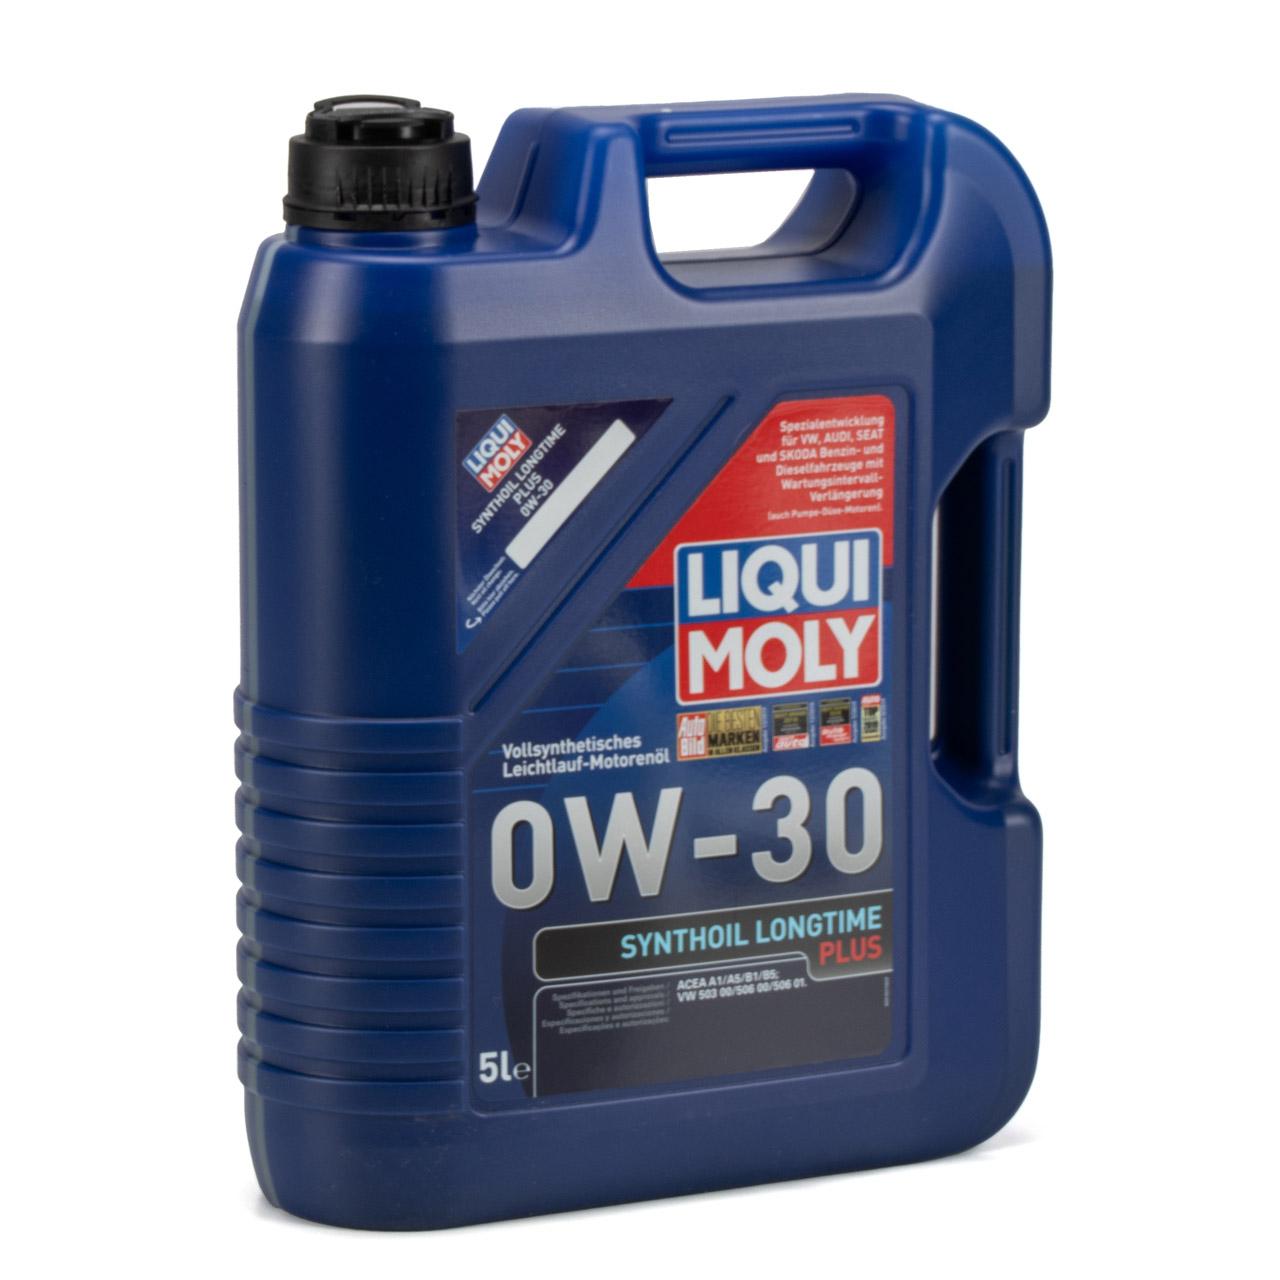 LIQUI MOLY SYNTHOIL LONGTIME PLUS Motoröl Öl 0W30 VW 503/506.00 - 10L 10 Liter